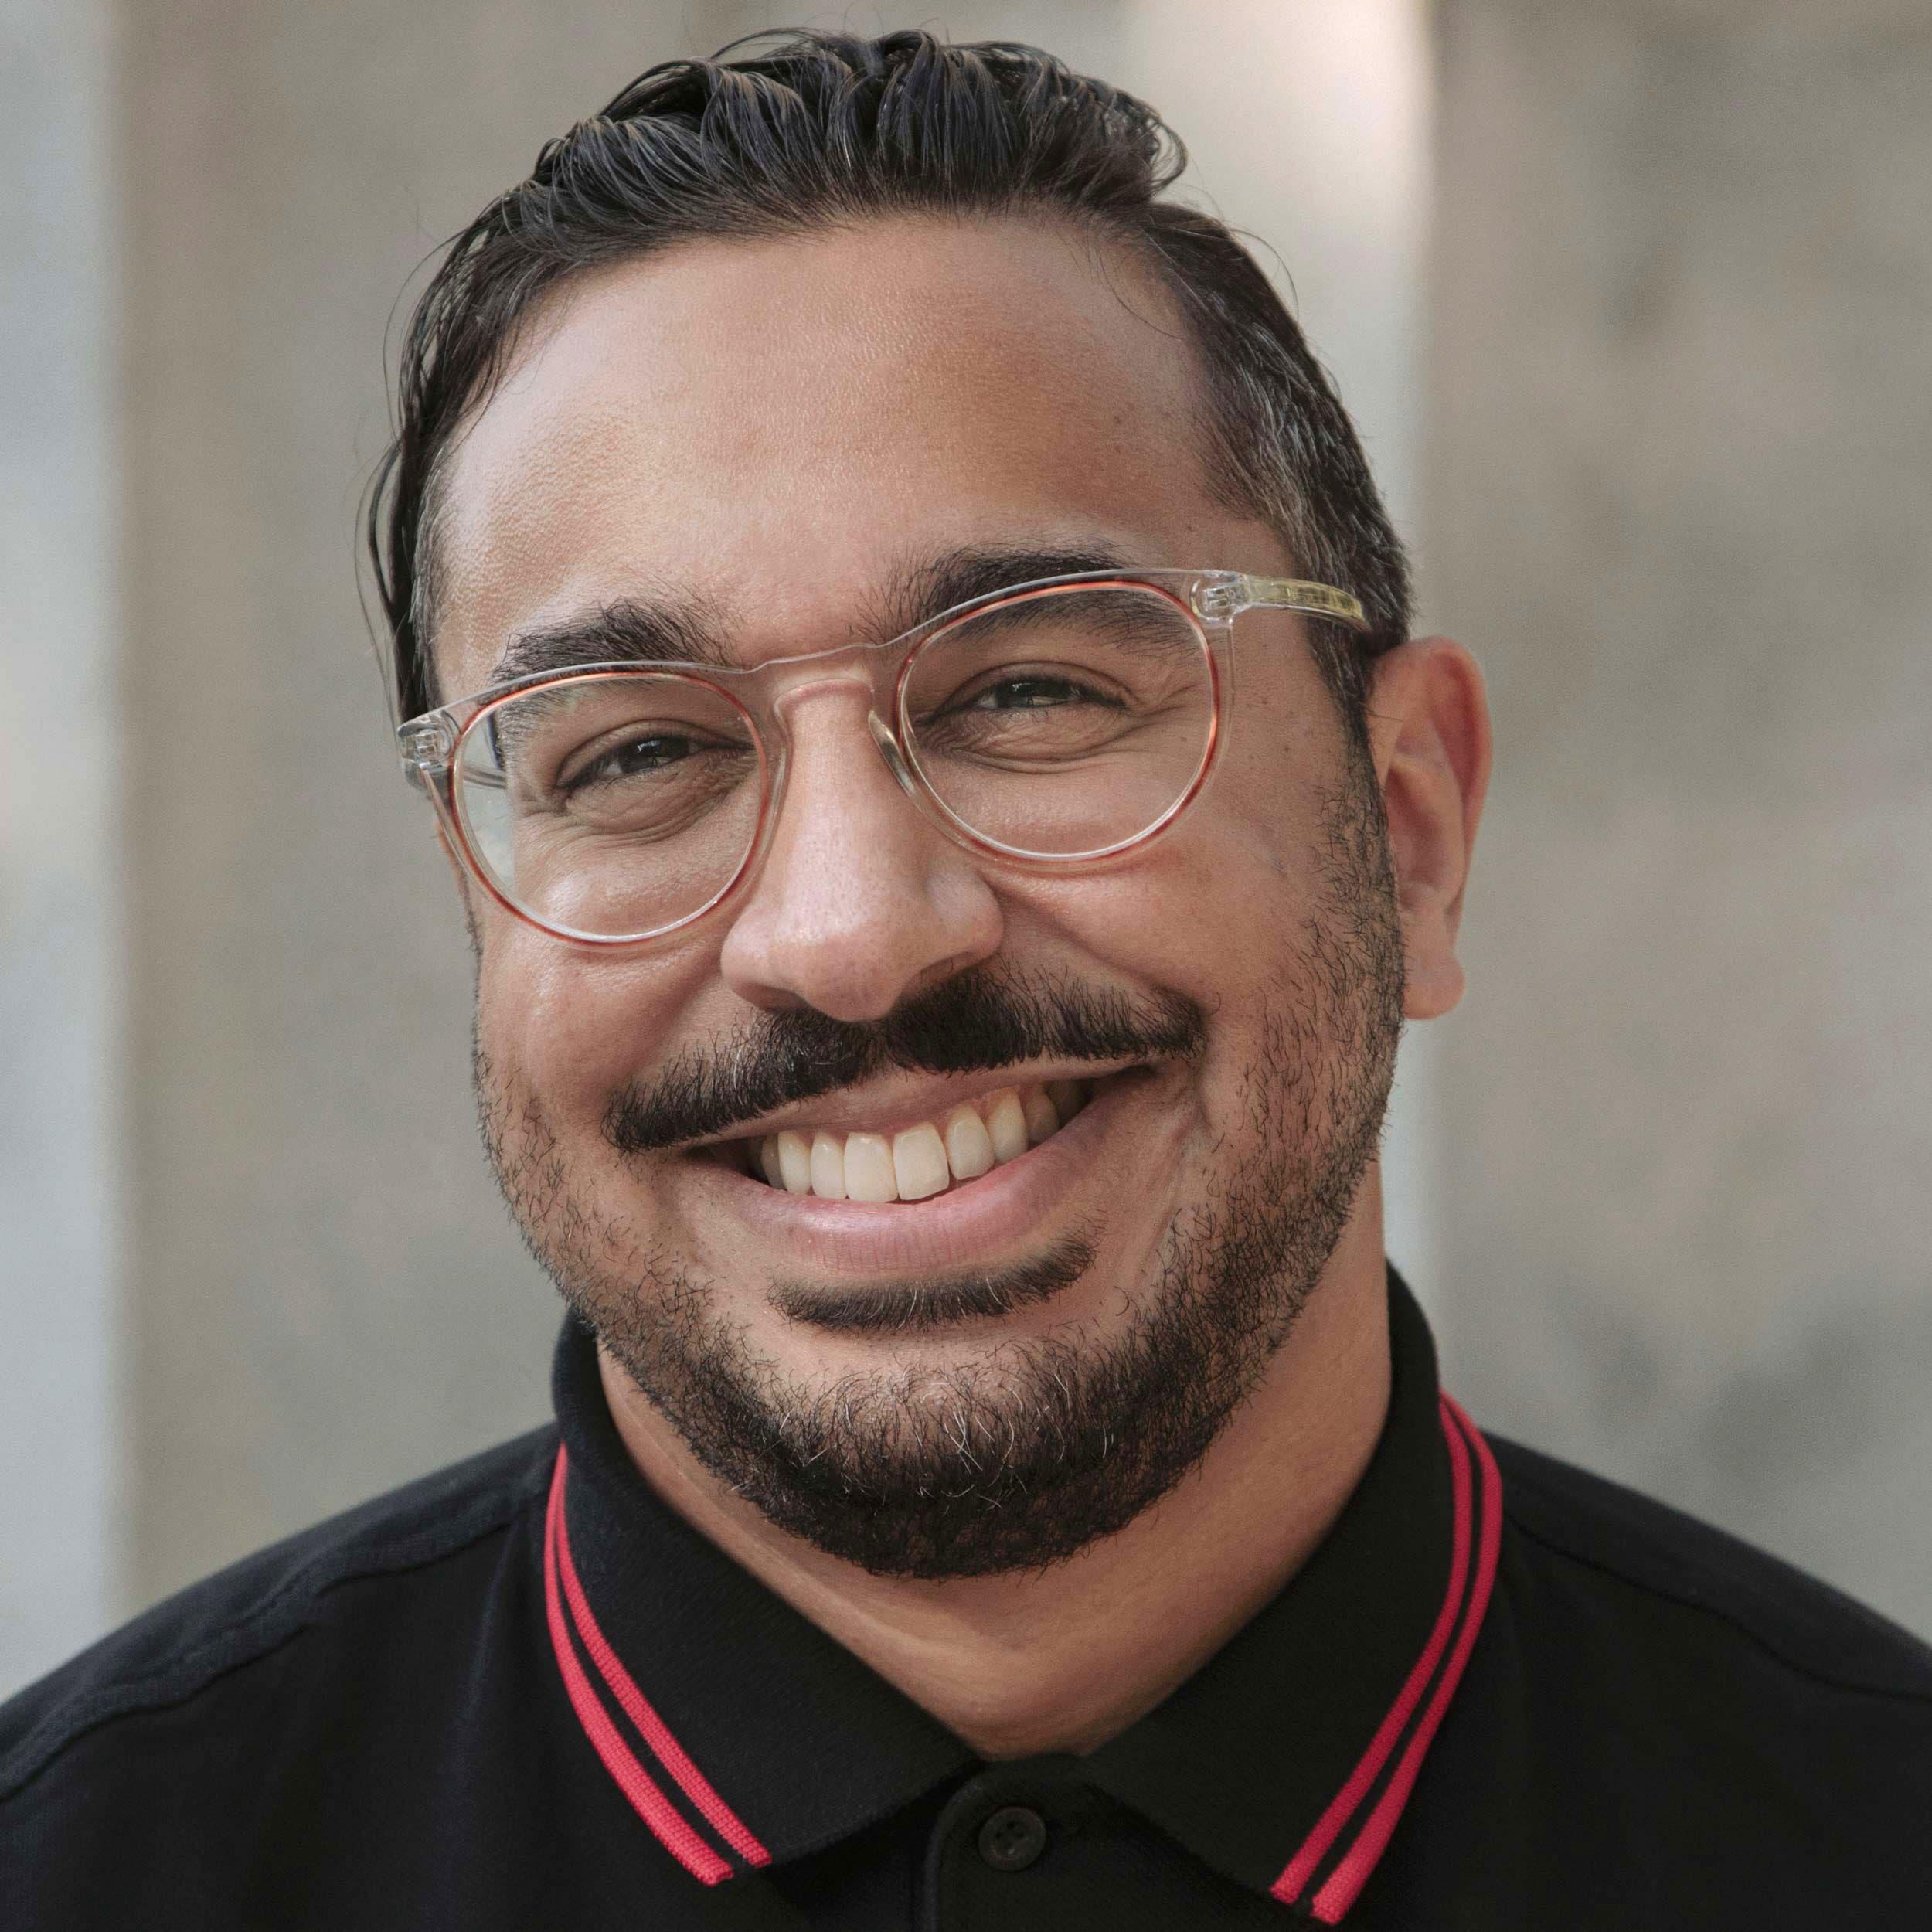 Headshot of Mesh Lakhani